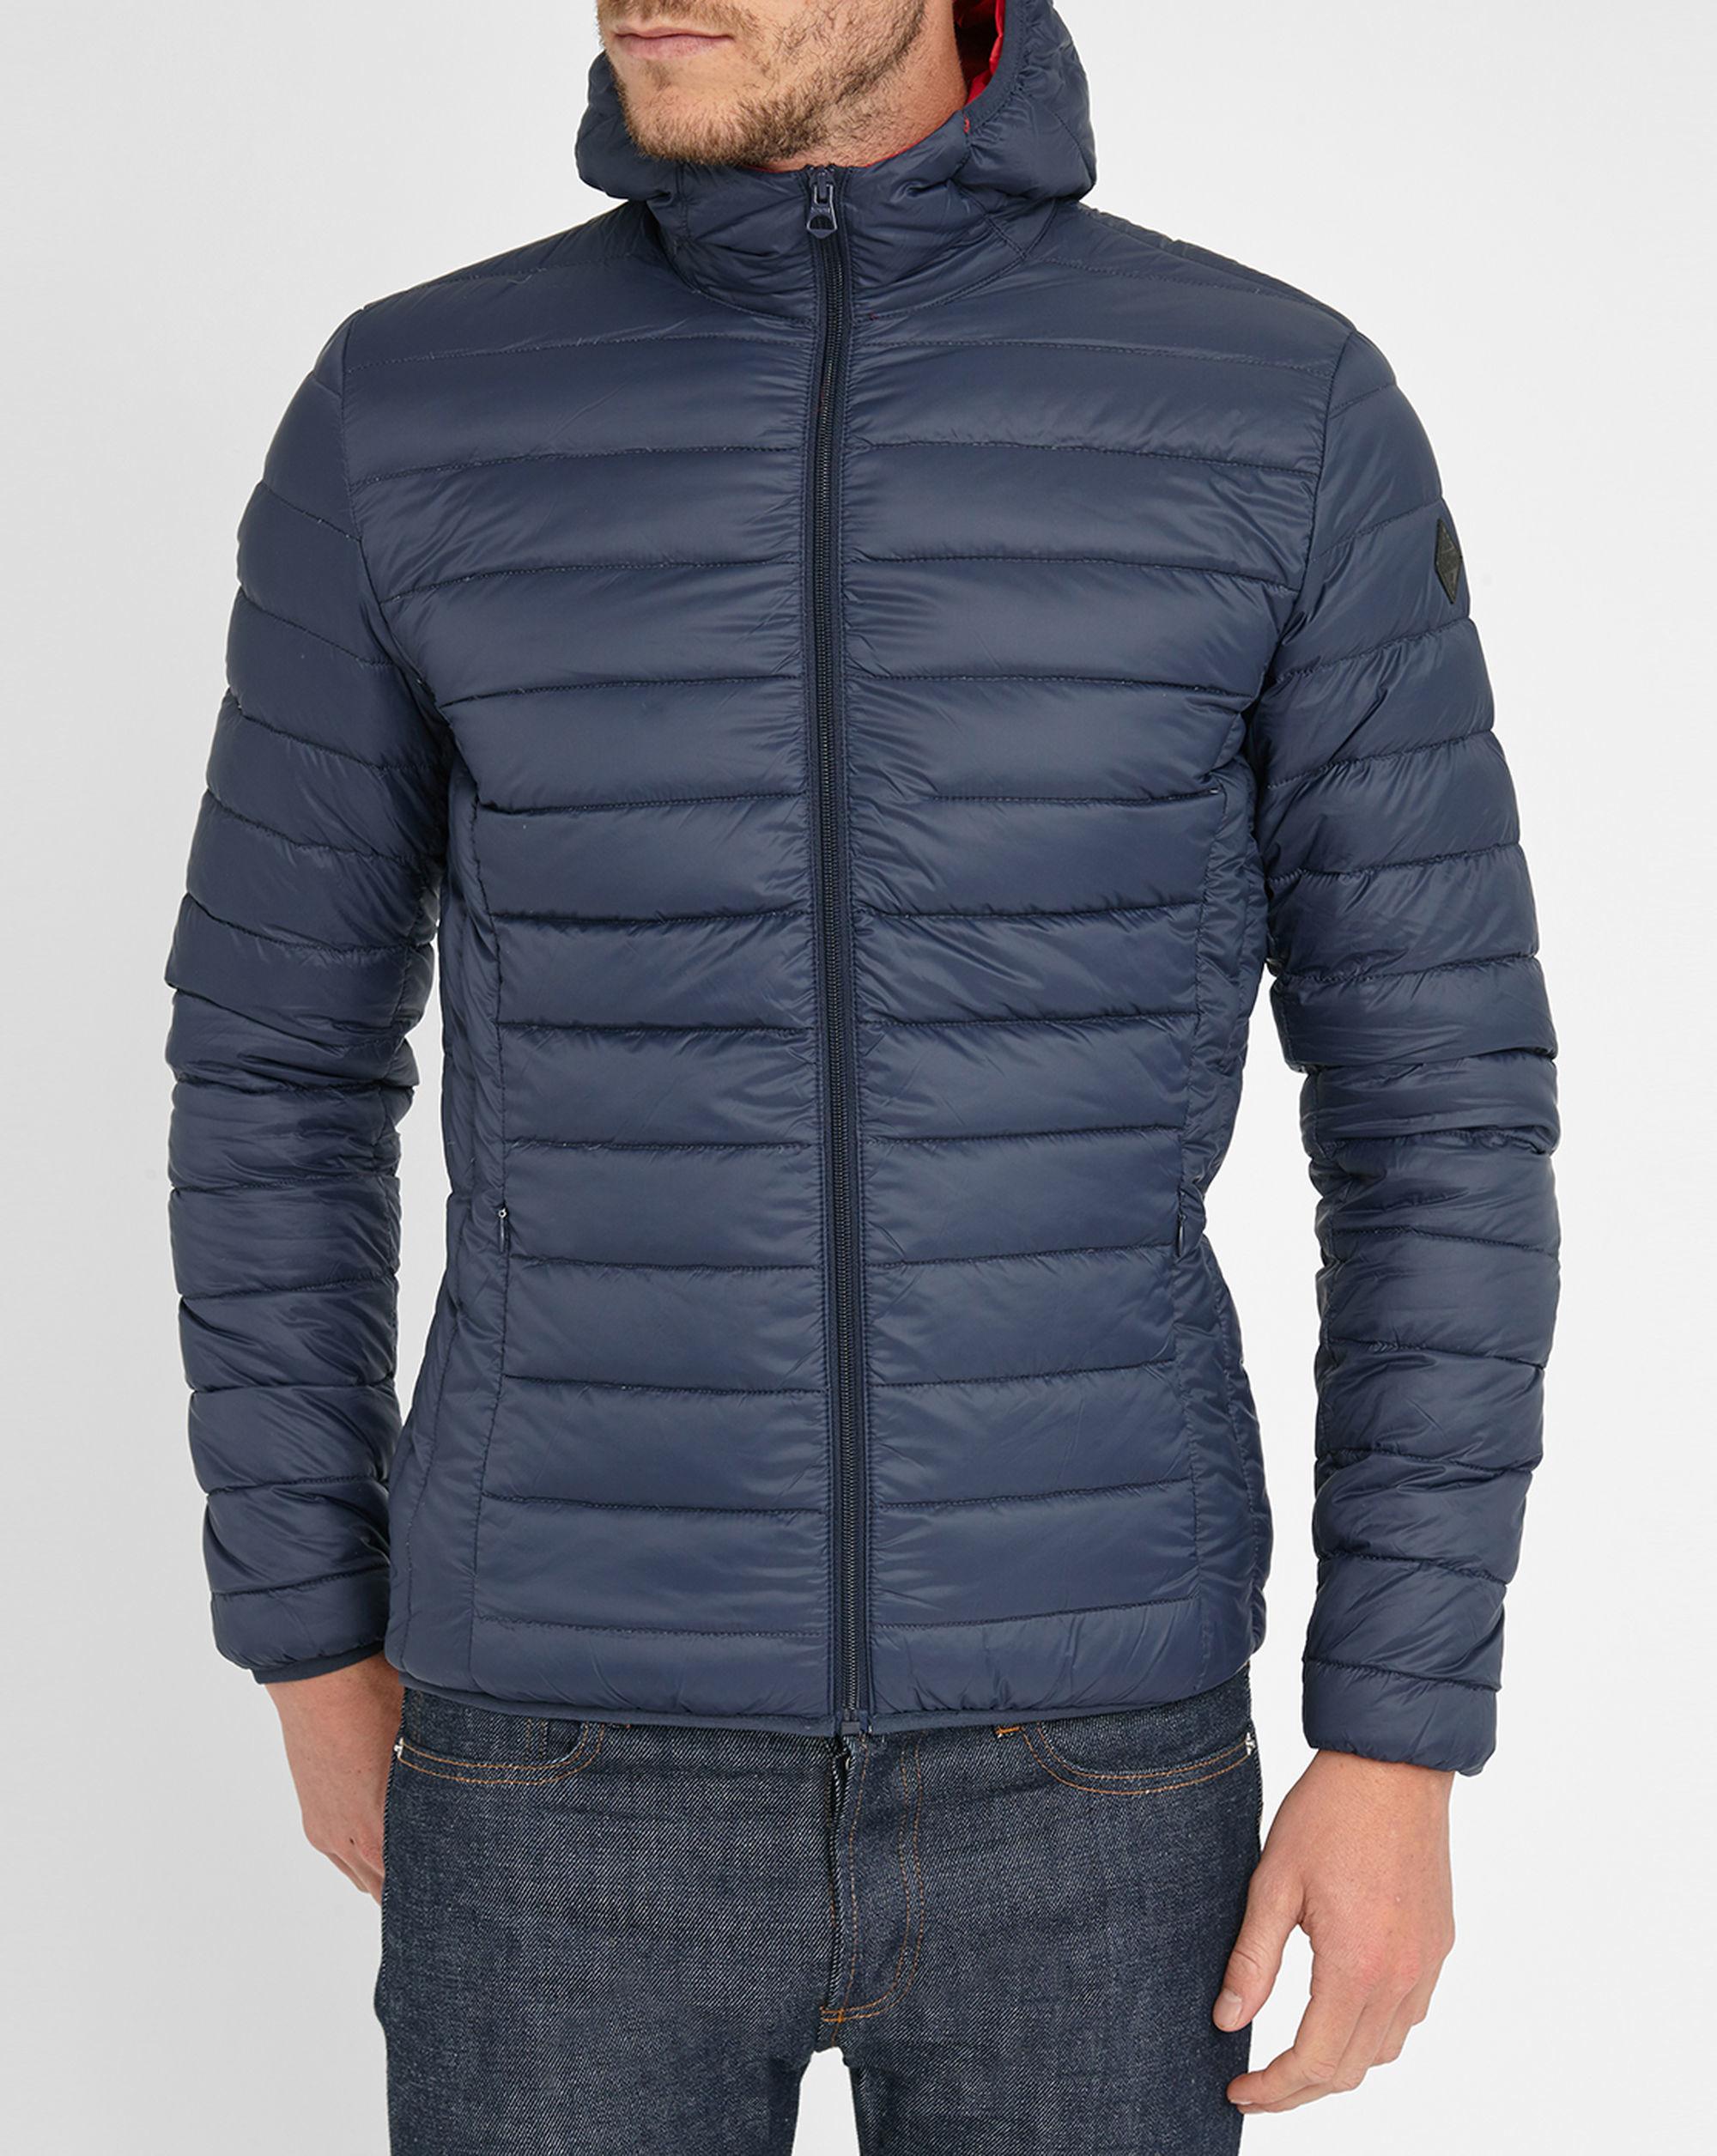 schott nyc navy light feather down jacket in blue for men lyst. Black Bedroom Furniture Sets. Home Design Ideas